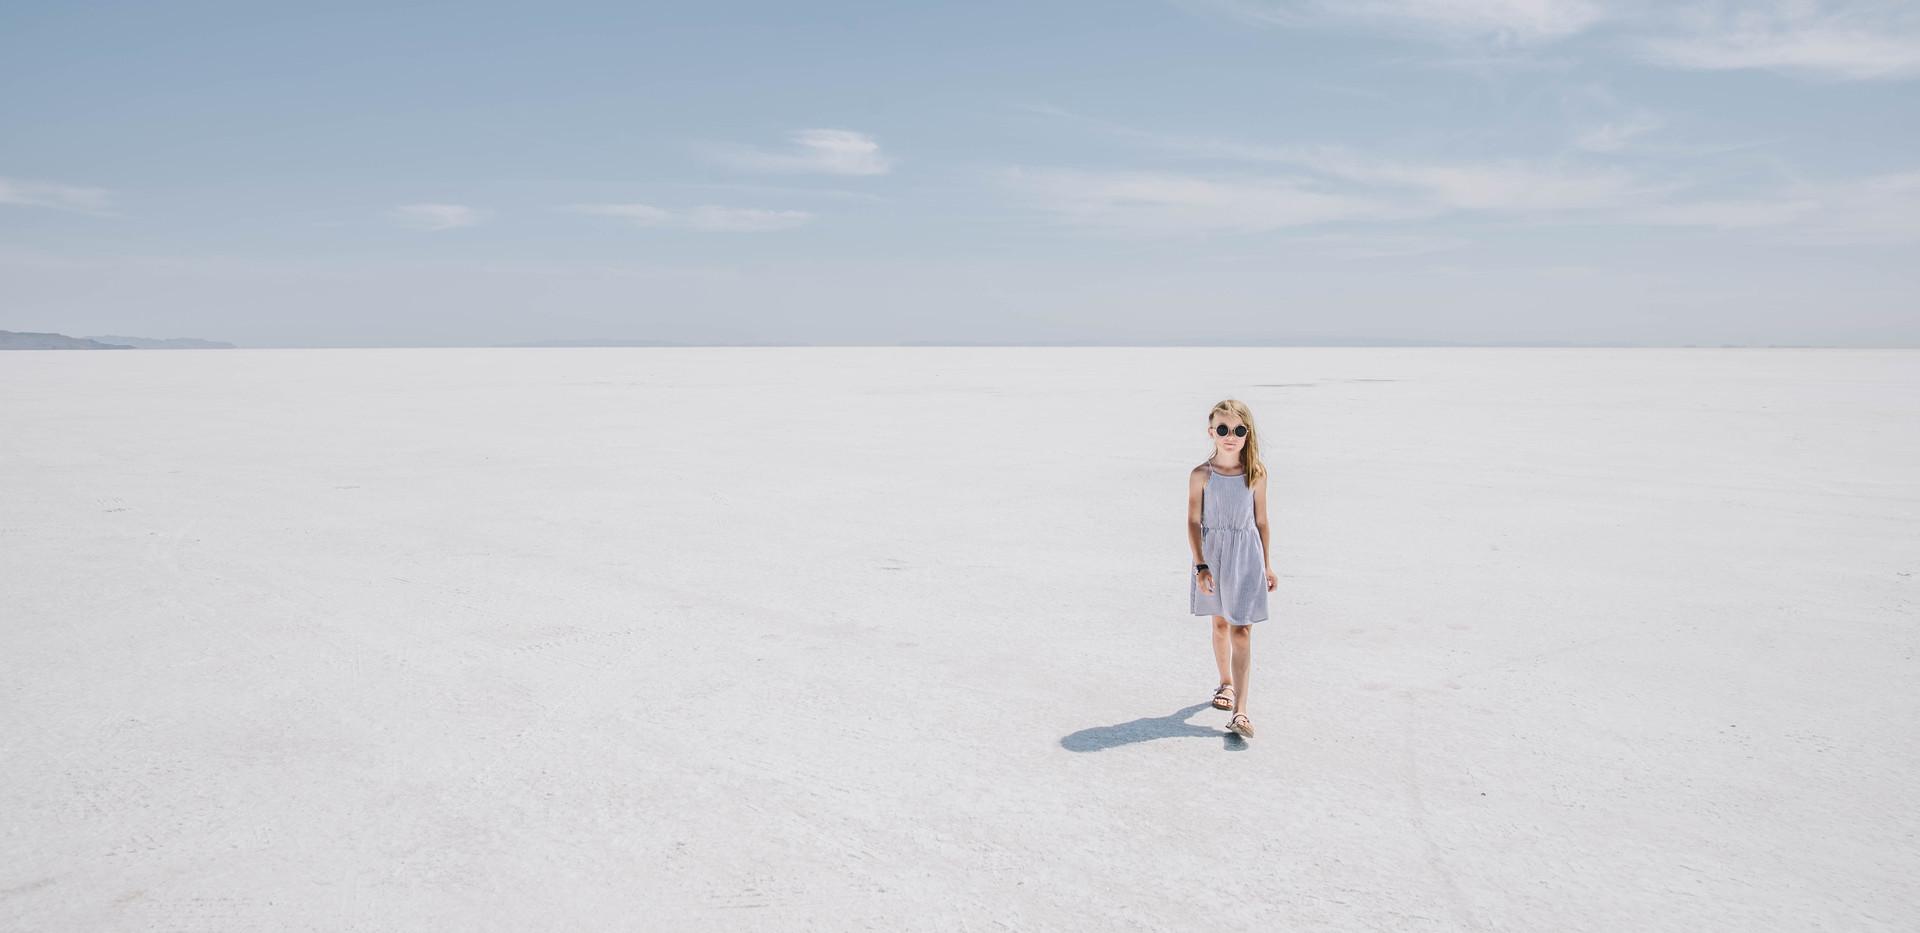 Salt Flats, UT